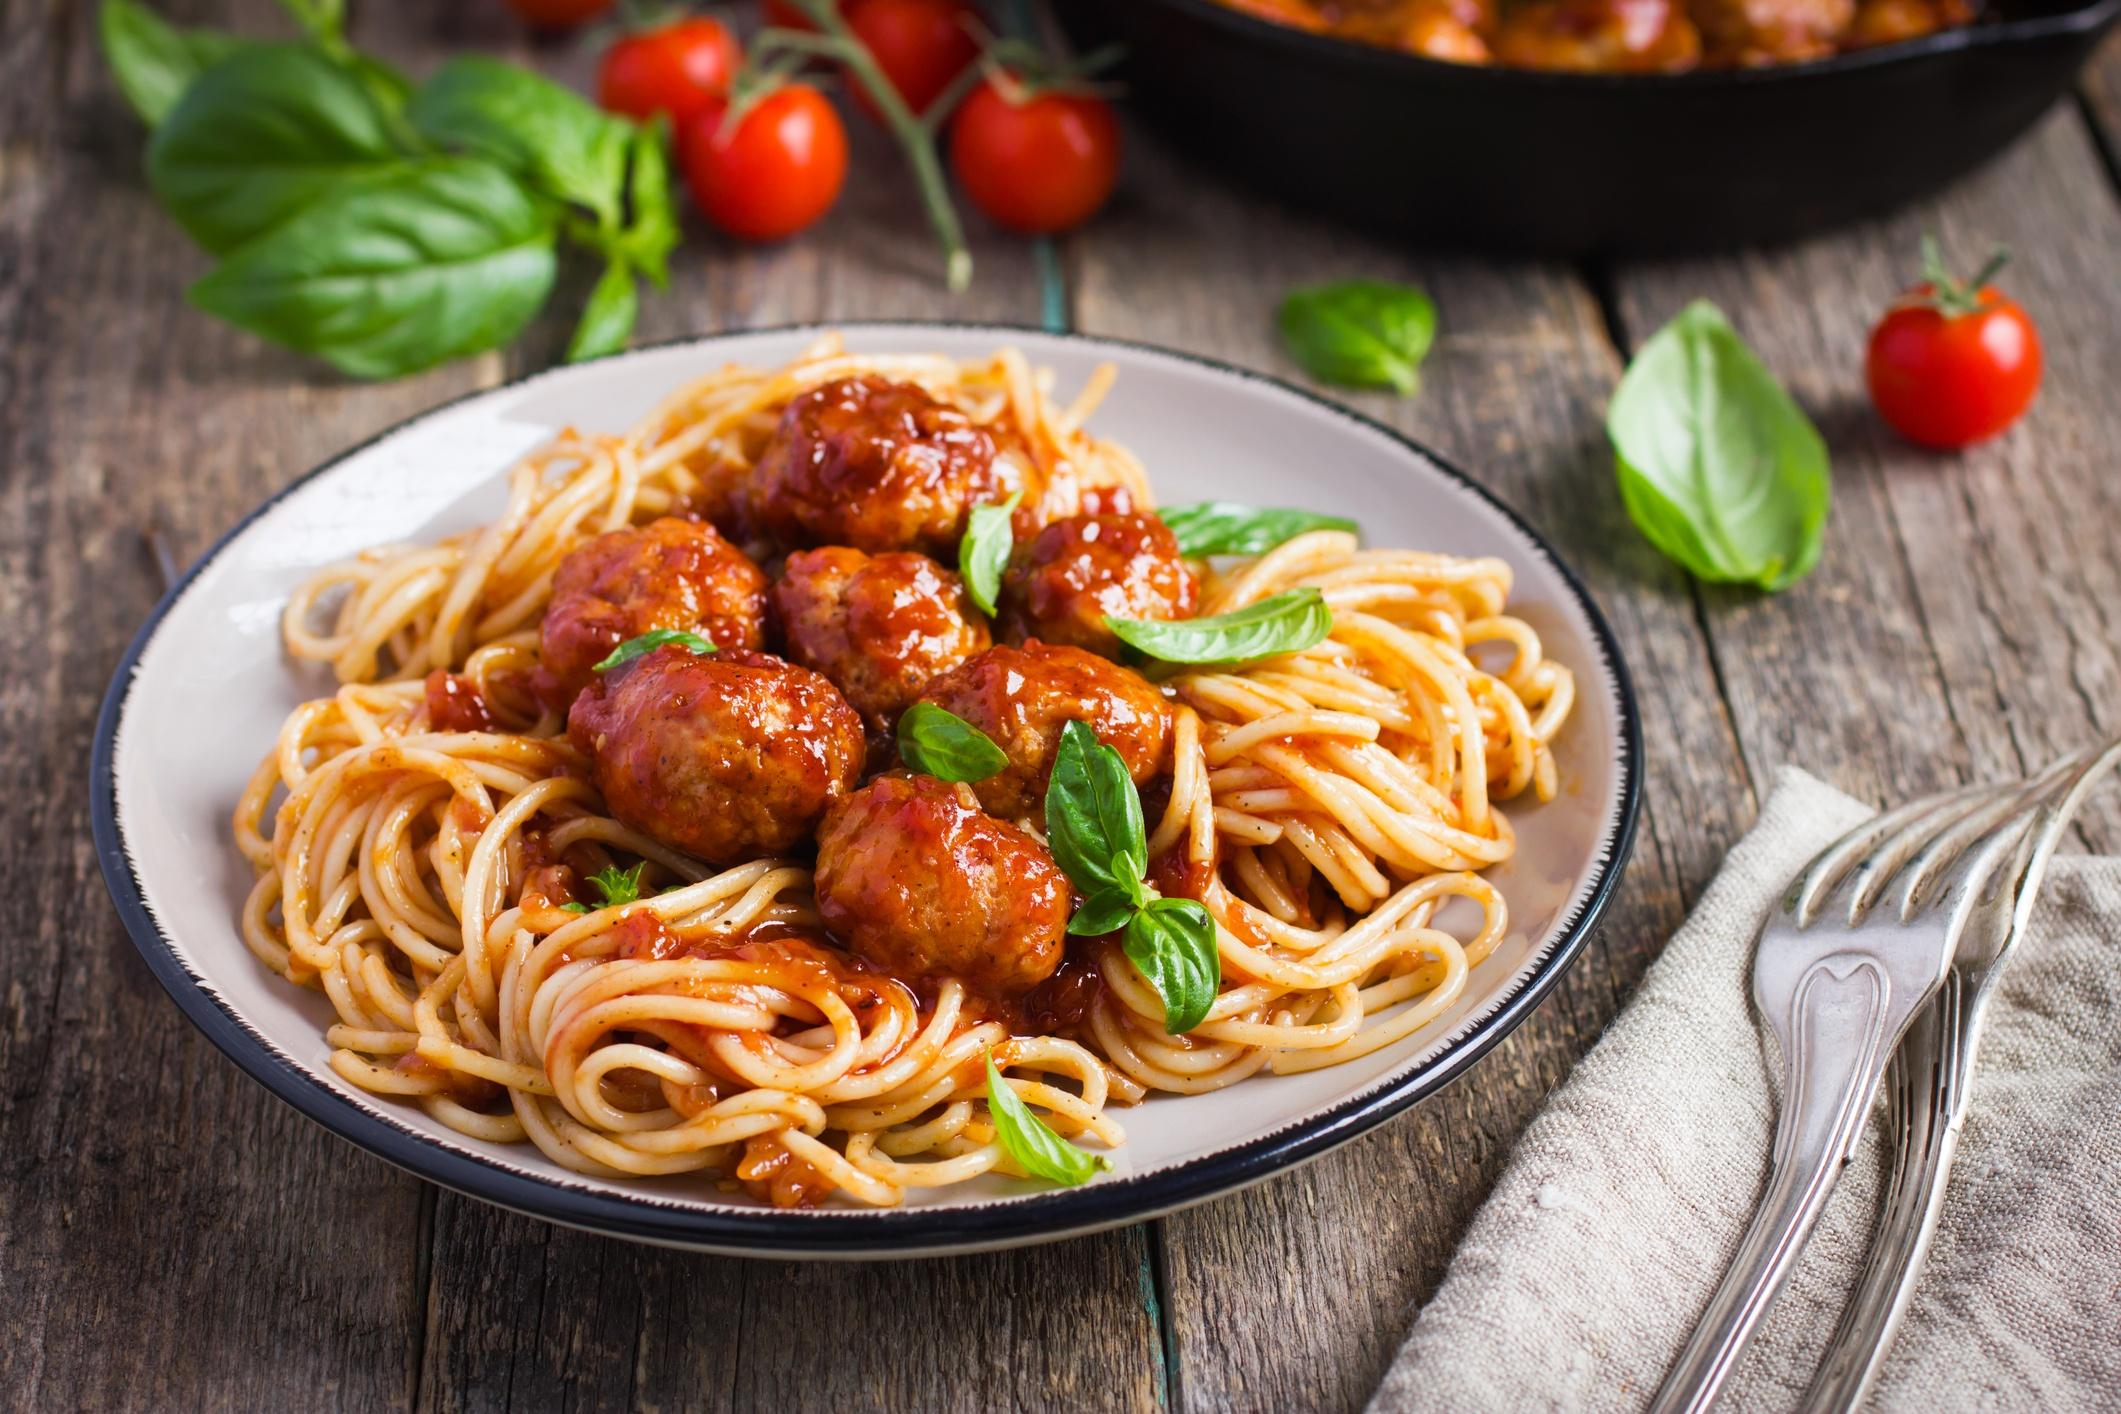 Spaghetti with Meatballs HD Wallpaper